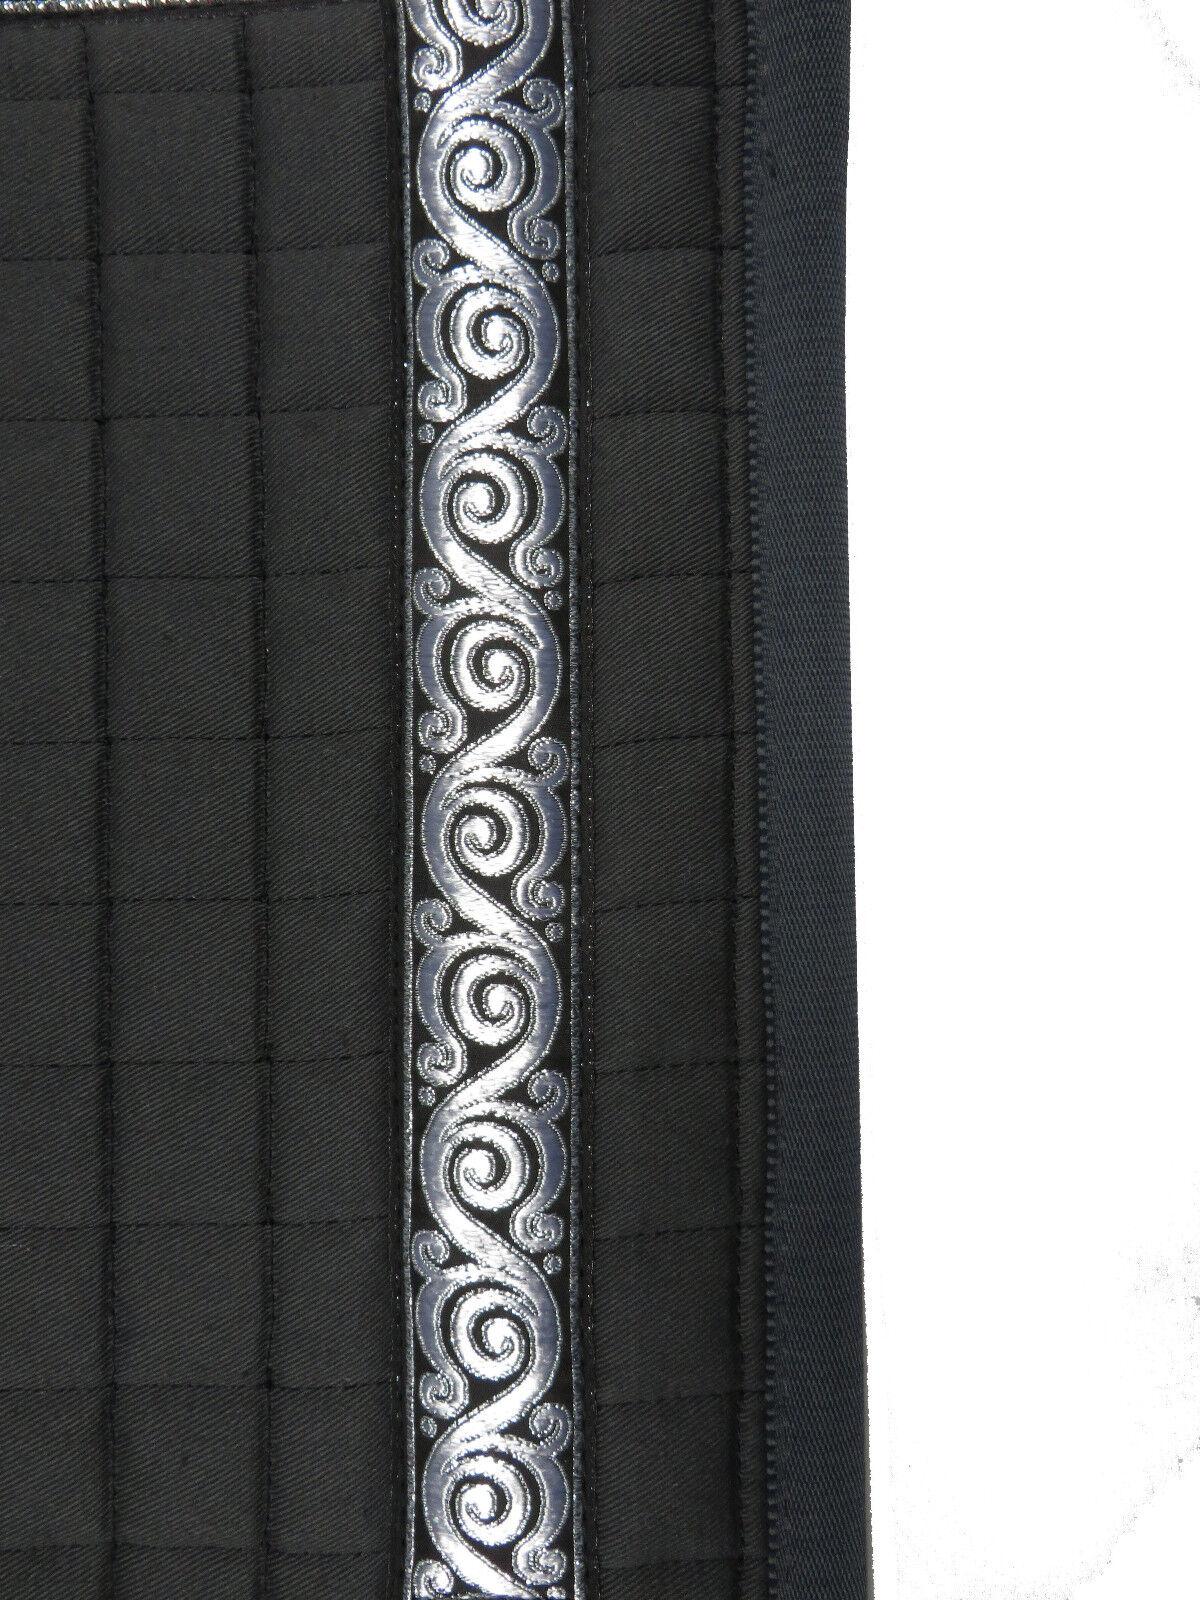 Barroco decrépita sillín manta gris con más bonita cenefa cenefa cenefa y polsterbaren bolsillos 5e5c17